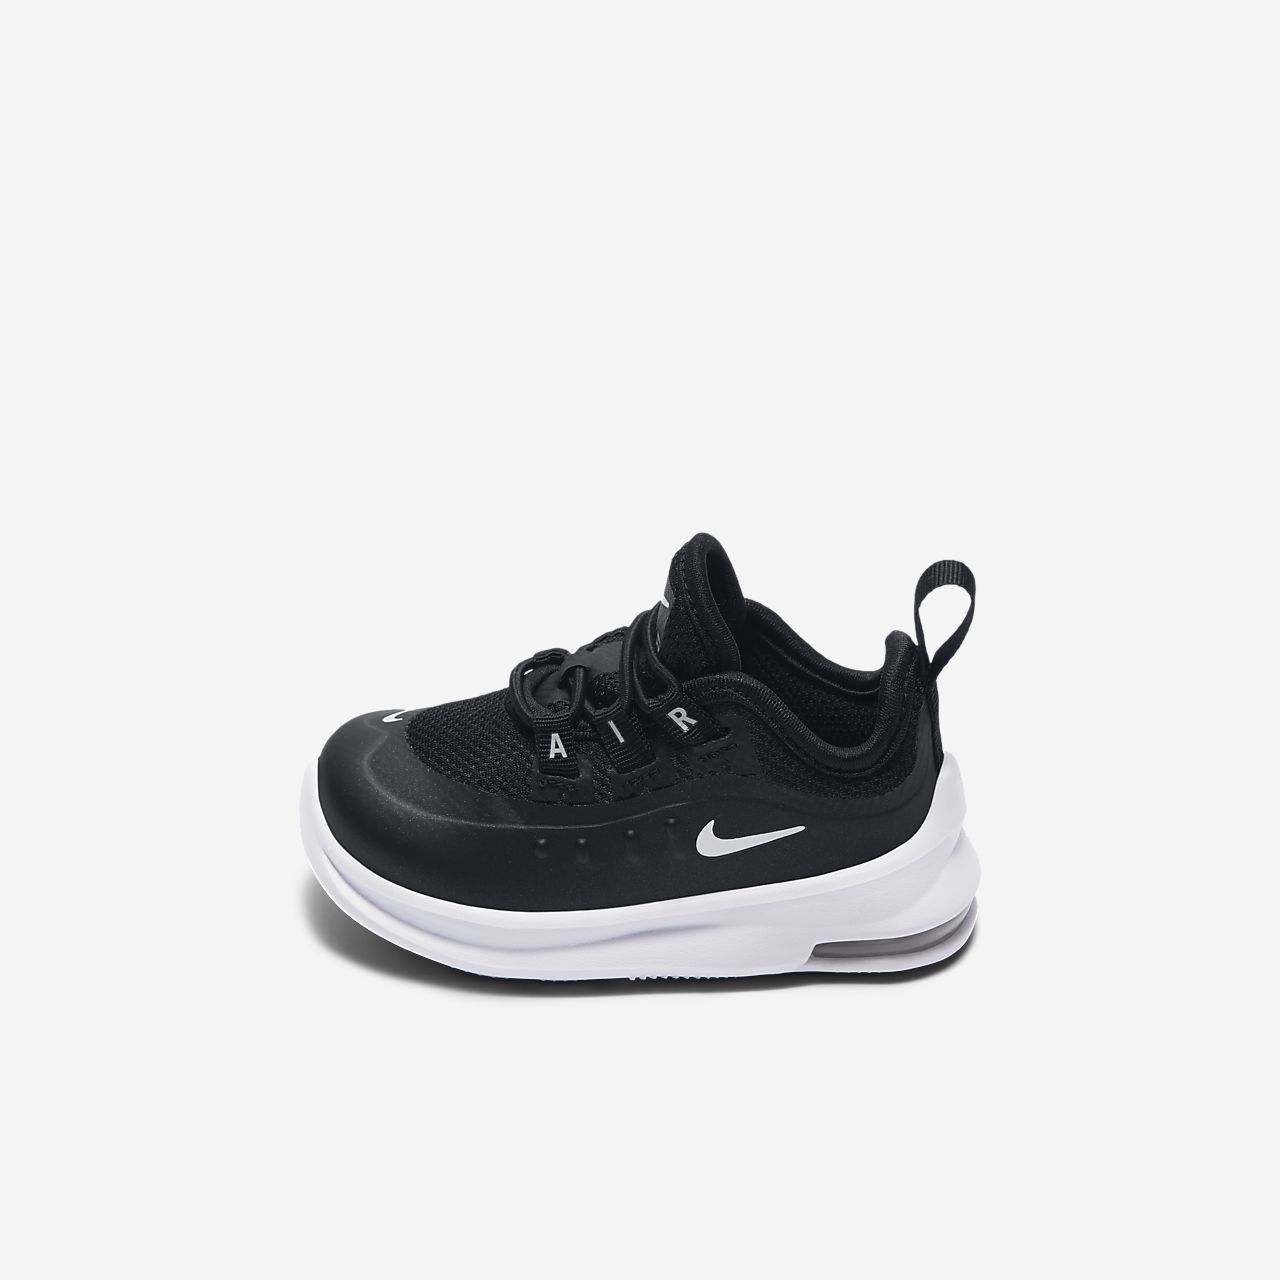 966d1f7654 Scarpa Nike Air Max Axis - Neonati/Bimbi piccoli. Nike.com IT